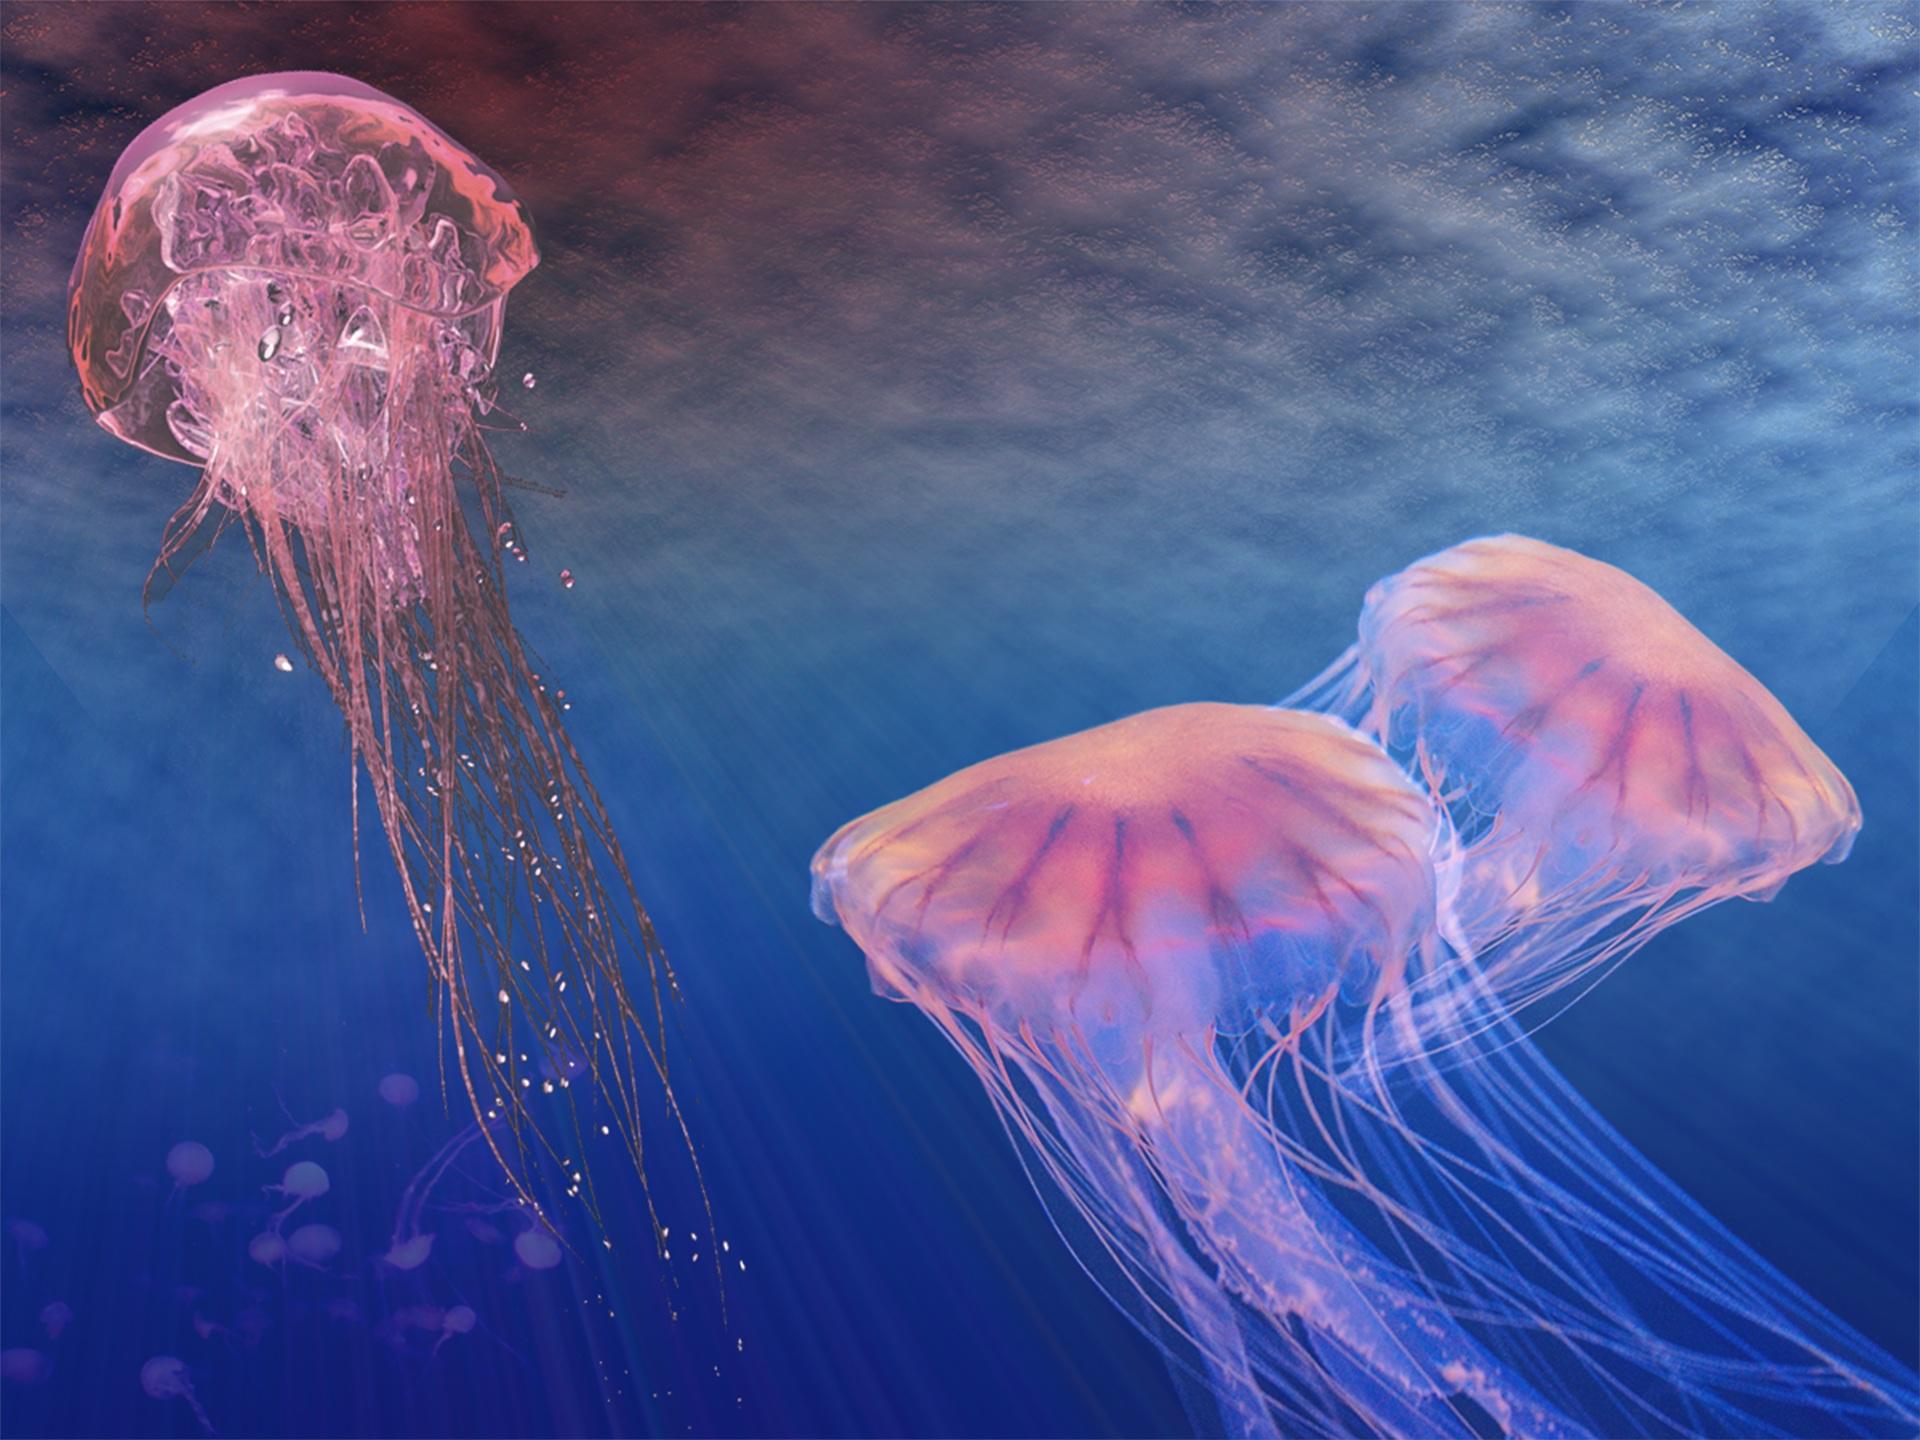 méduse, vie marine, Mer, Océan, profondeurs, Rosa - Fonds d'écran HD - Professor-falken.com